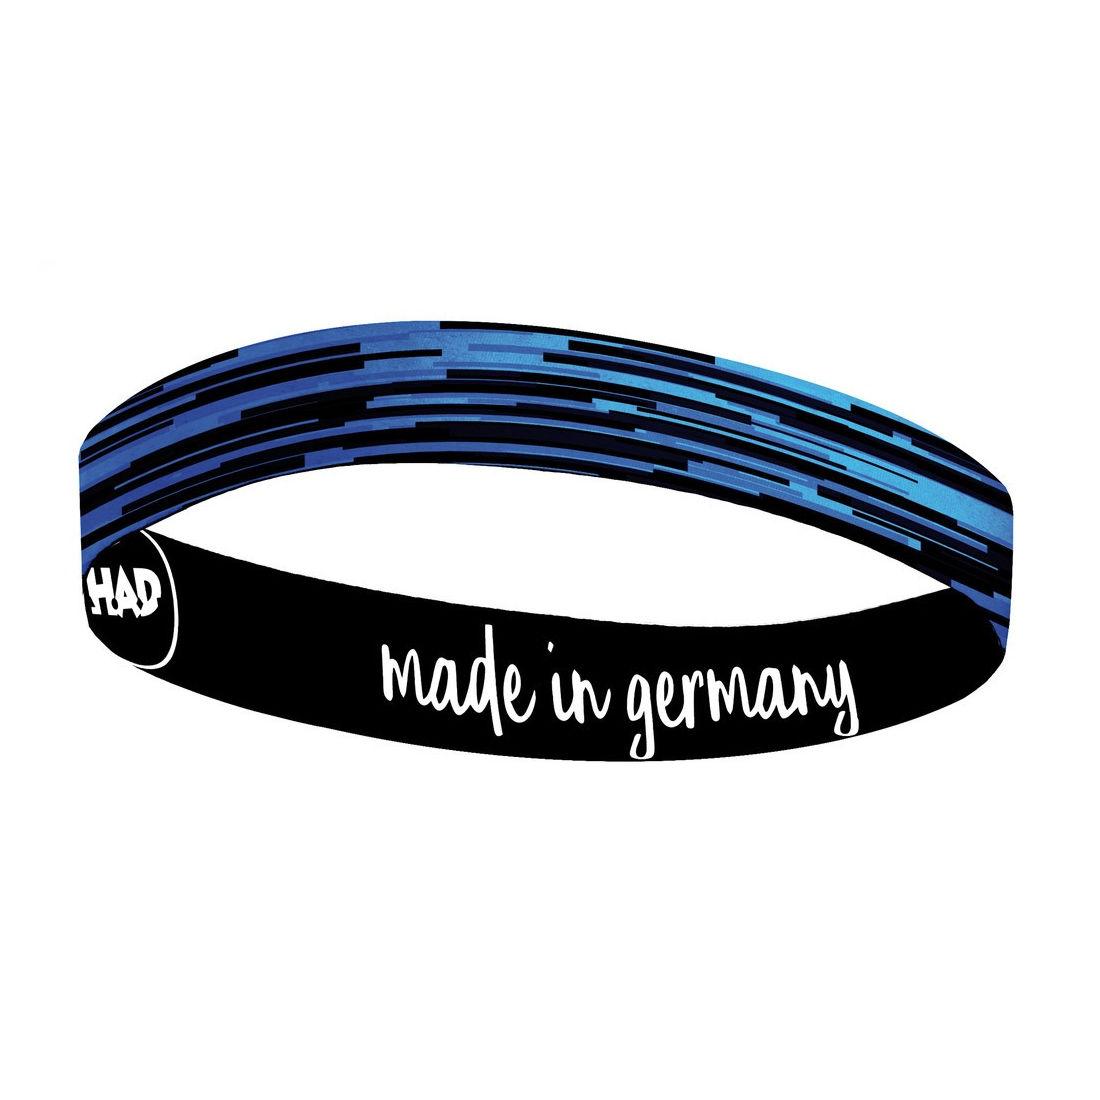 ProFeet H.A.D Flexband in Blau Schwarz